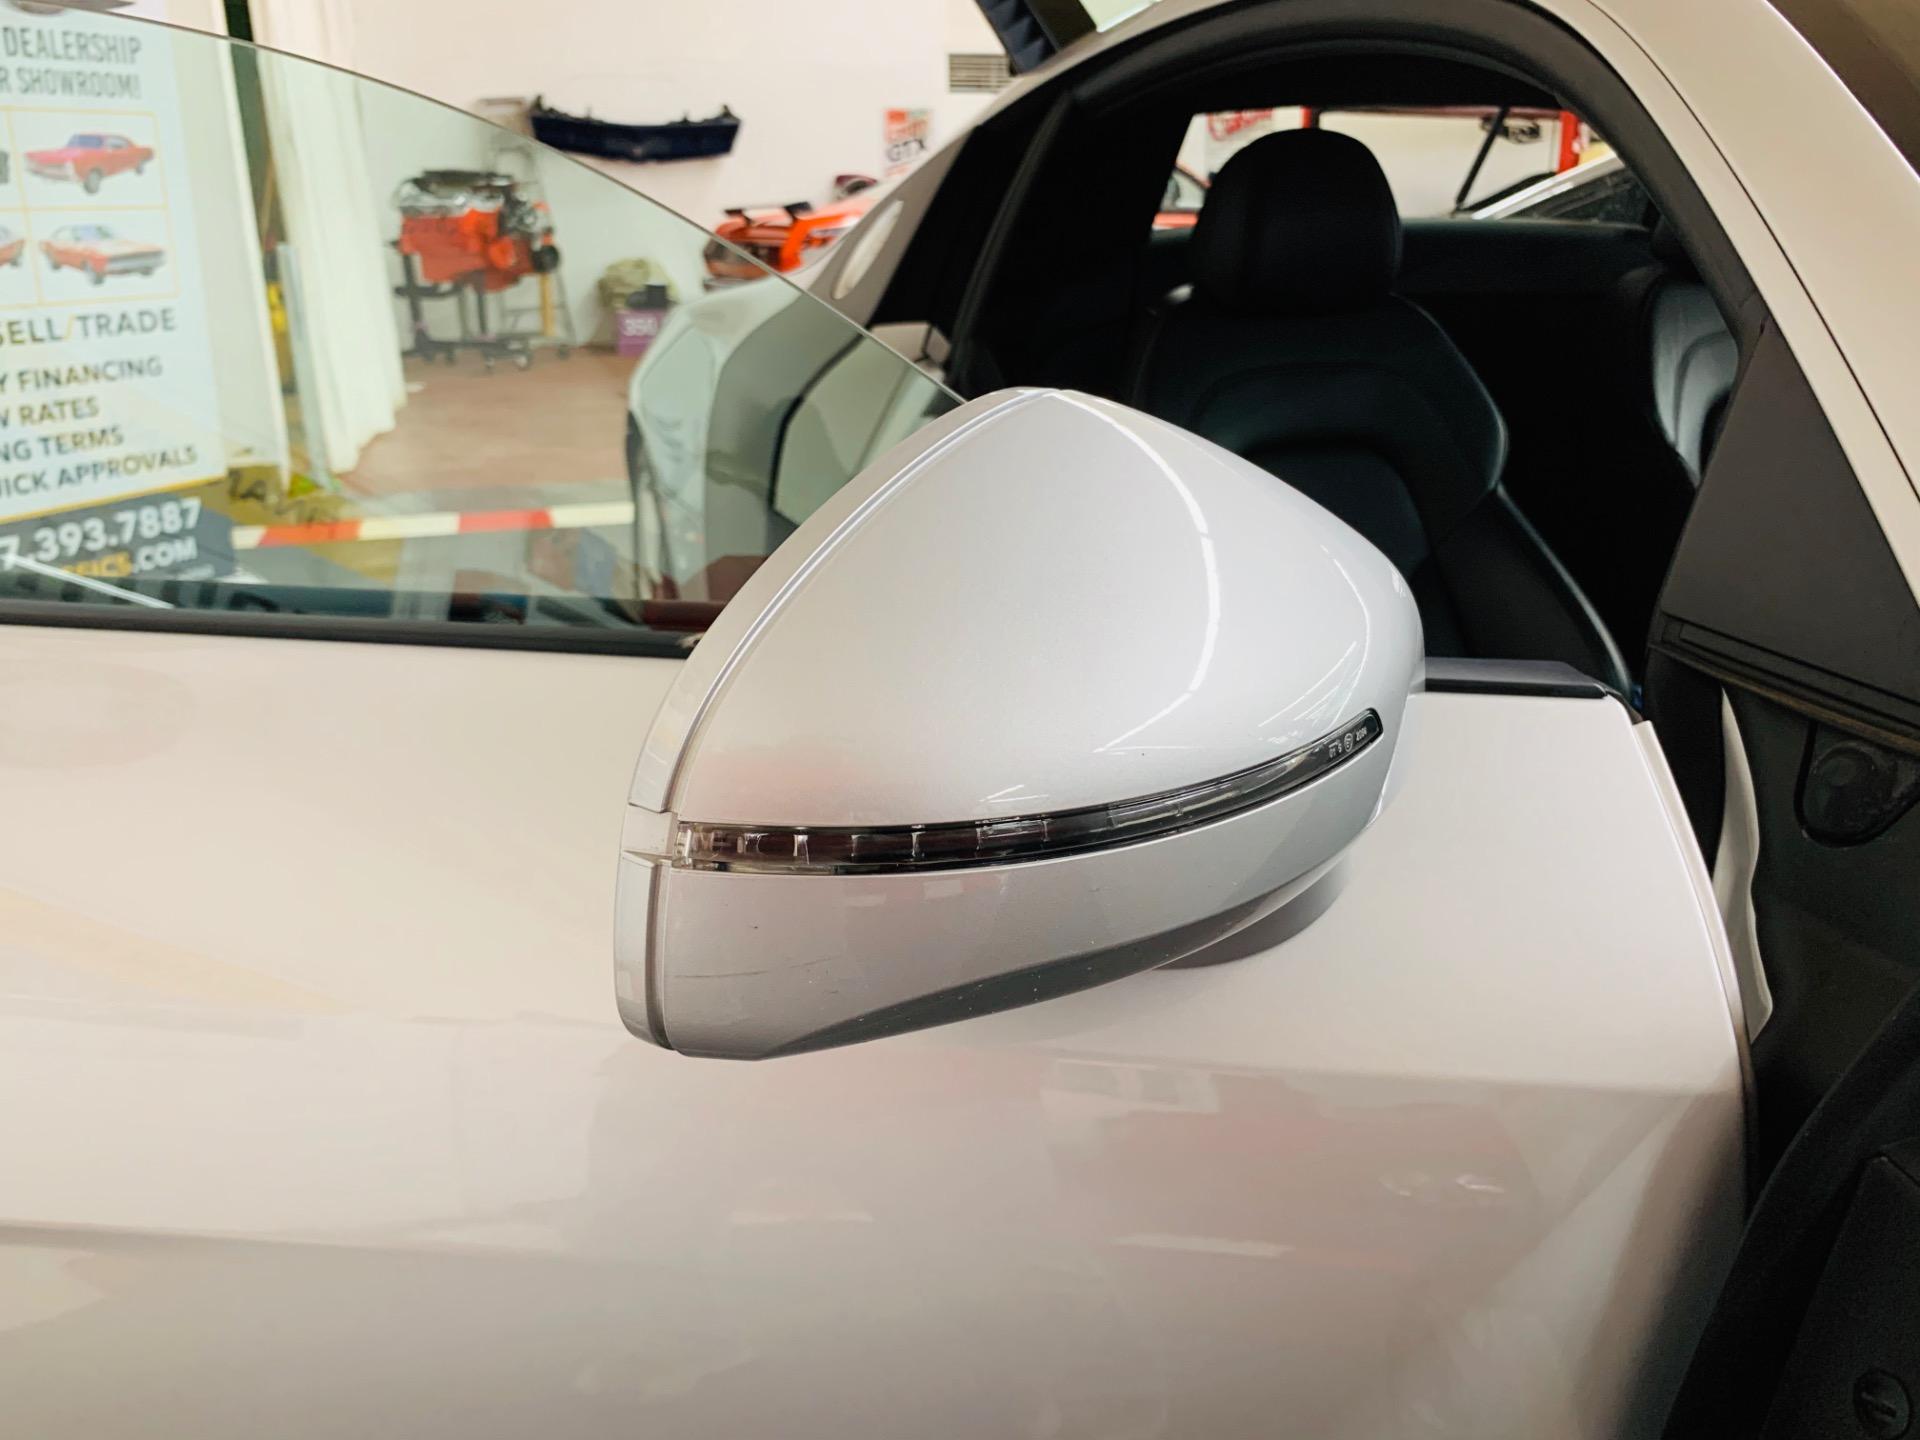 Used 2008 Audi R8 - QUATTRO - V8 ENGINE - VERY CLEAN - | Mundelein, IL